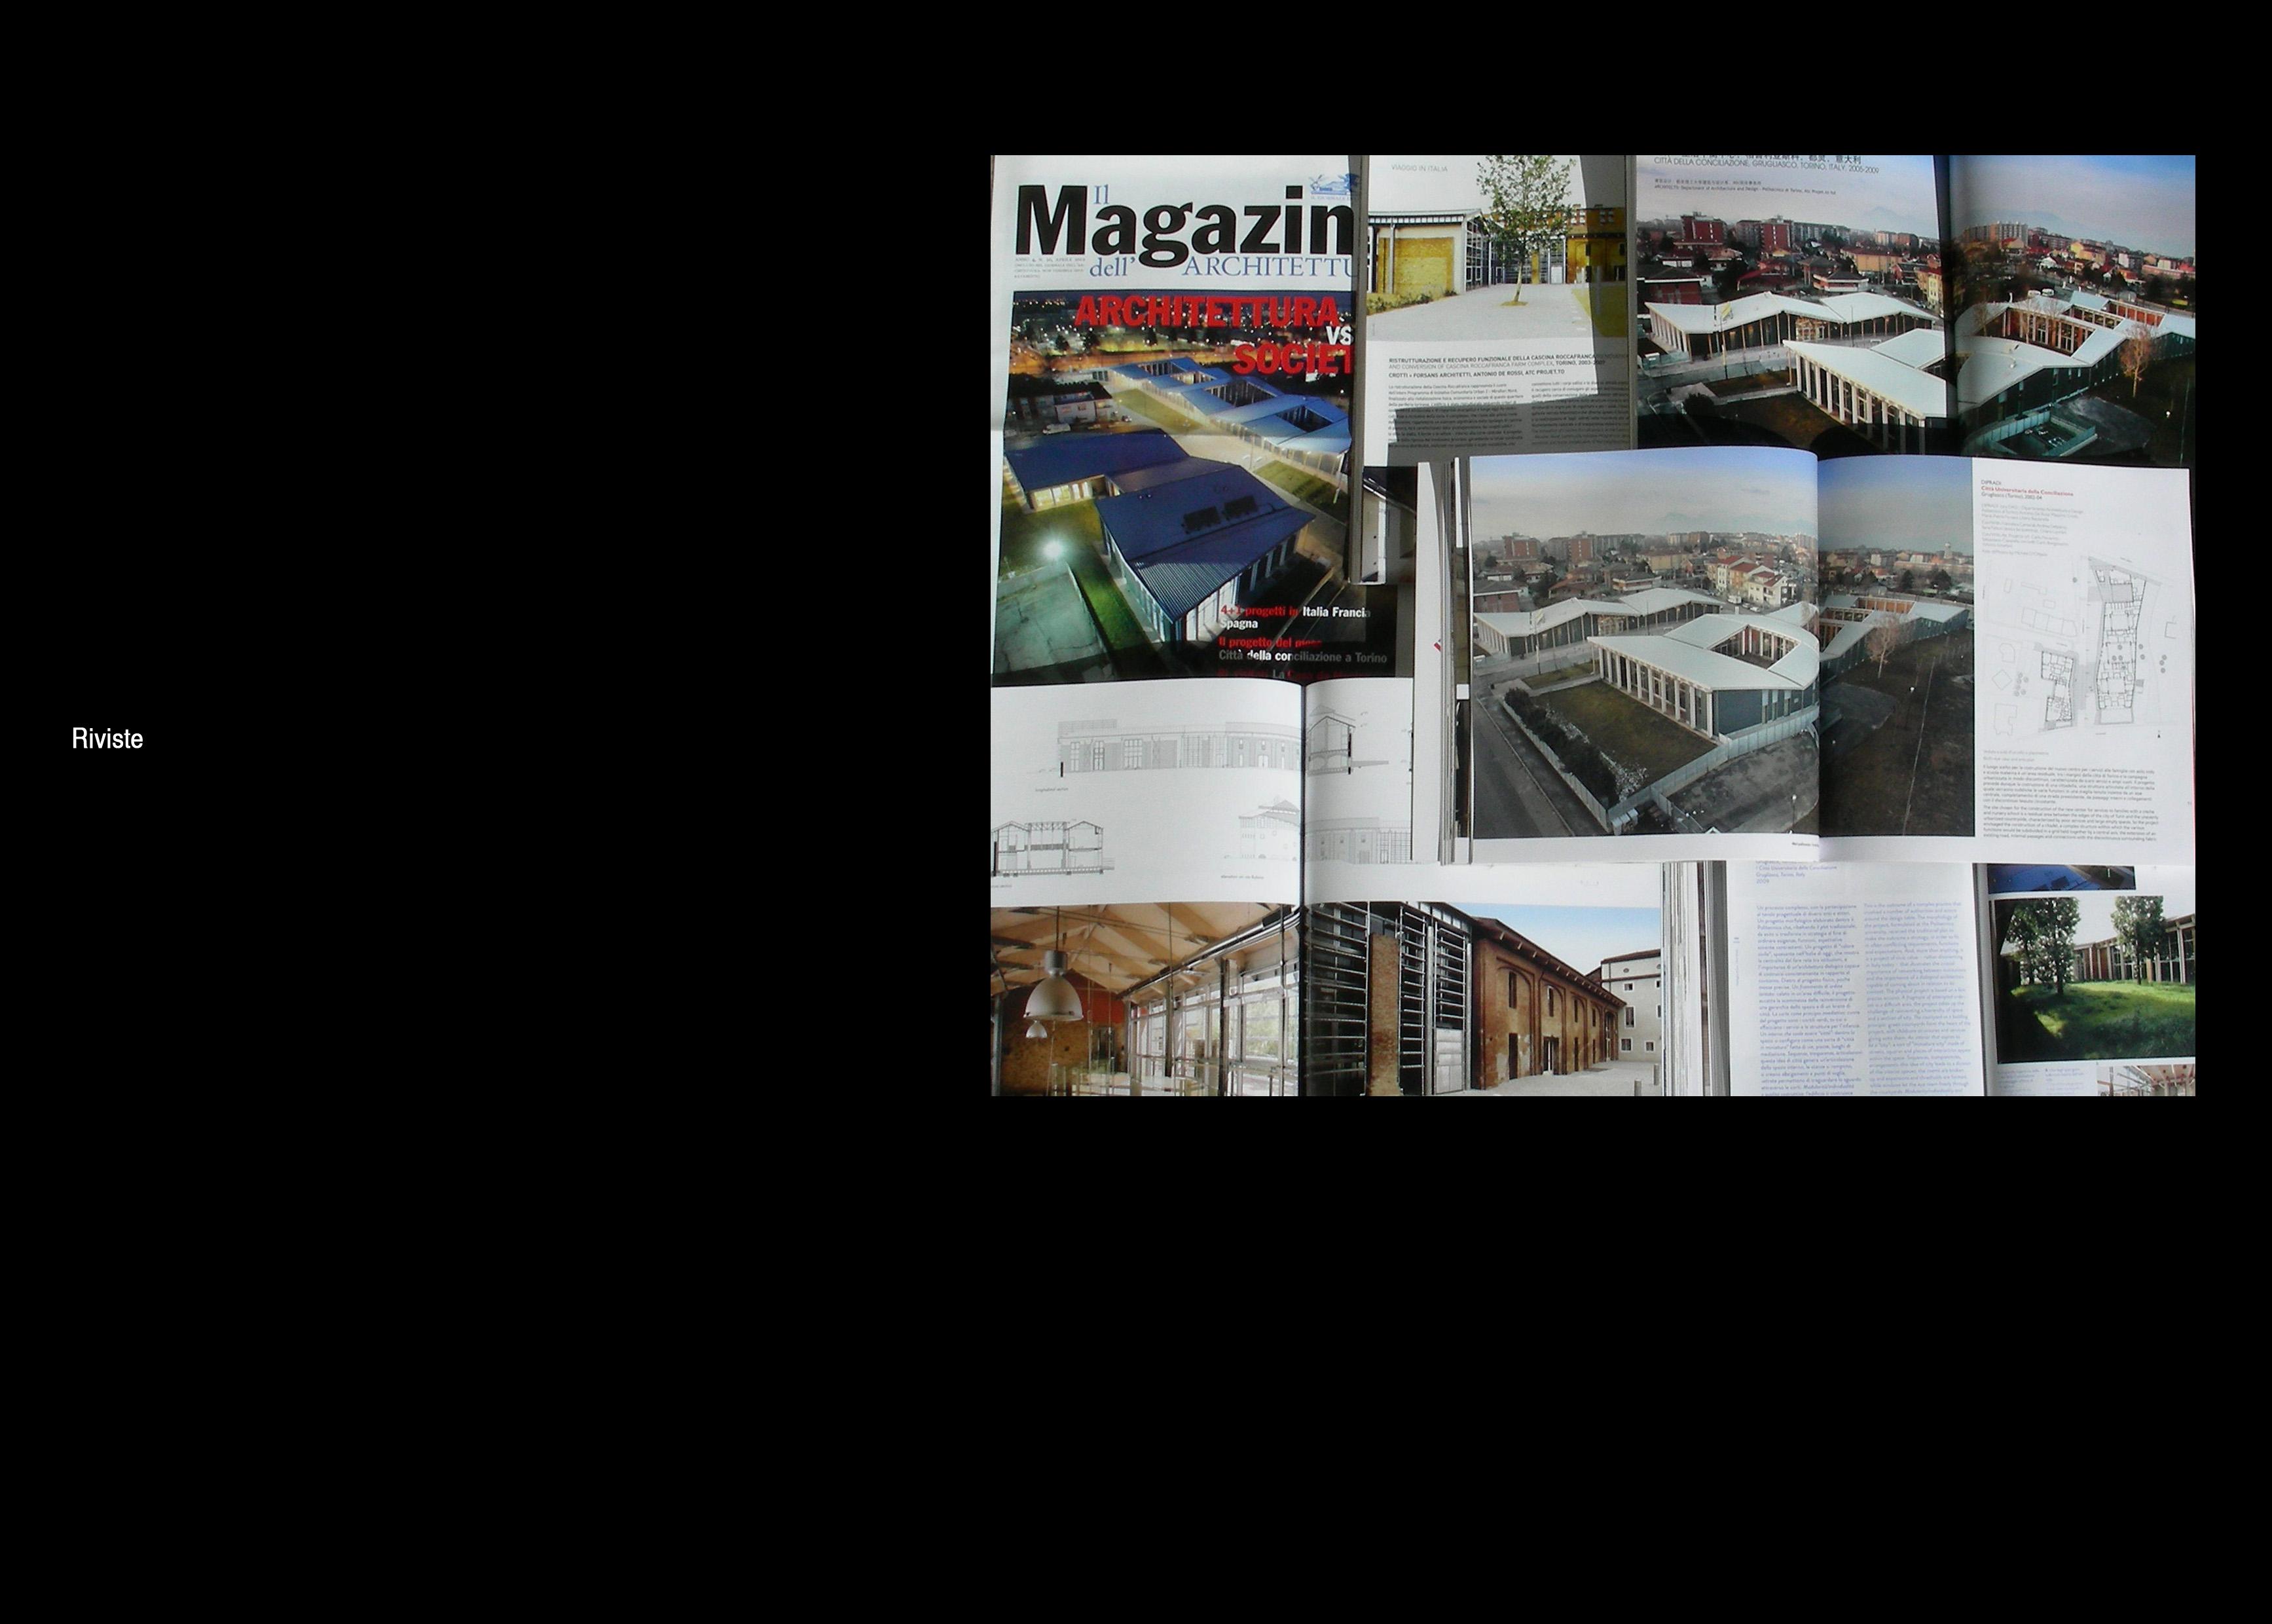 25_riviste-1